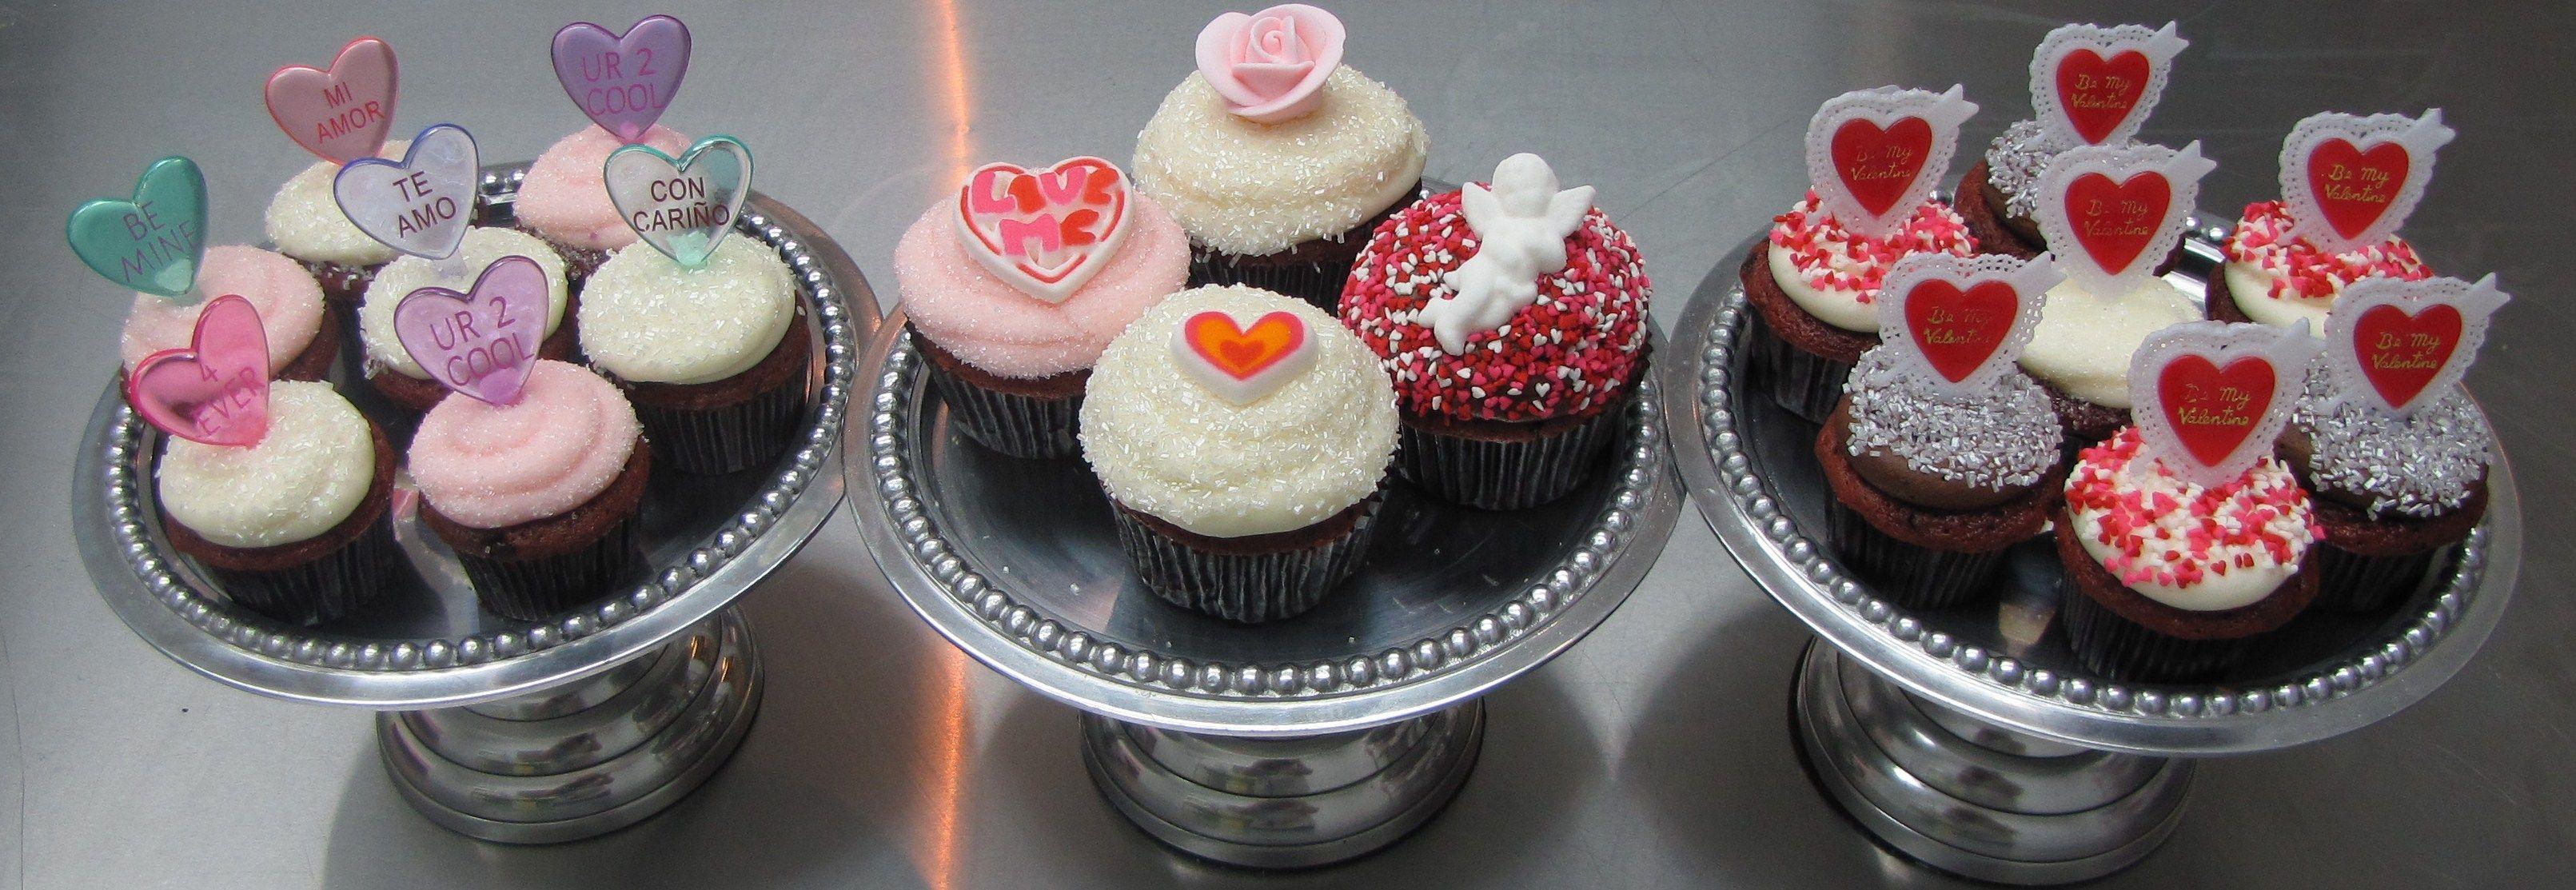 Cupcakes Misha S Miami C Gables Beach Mishas